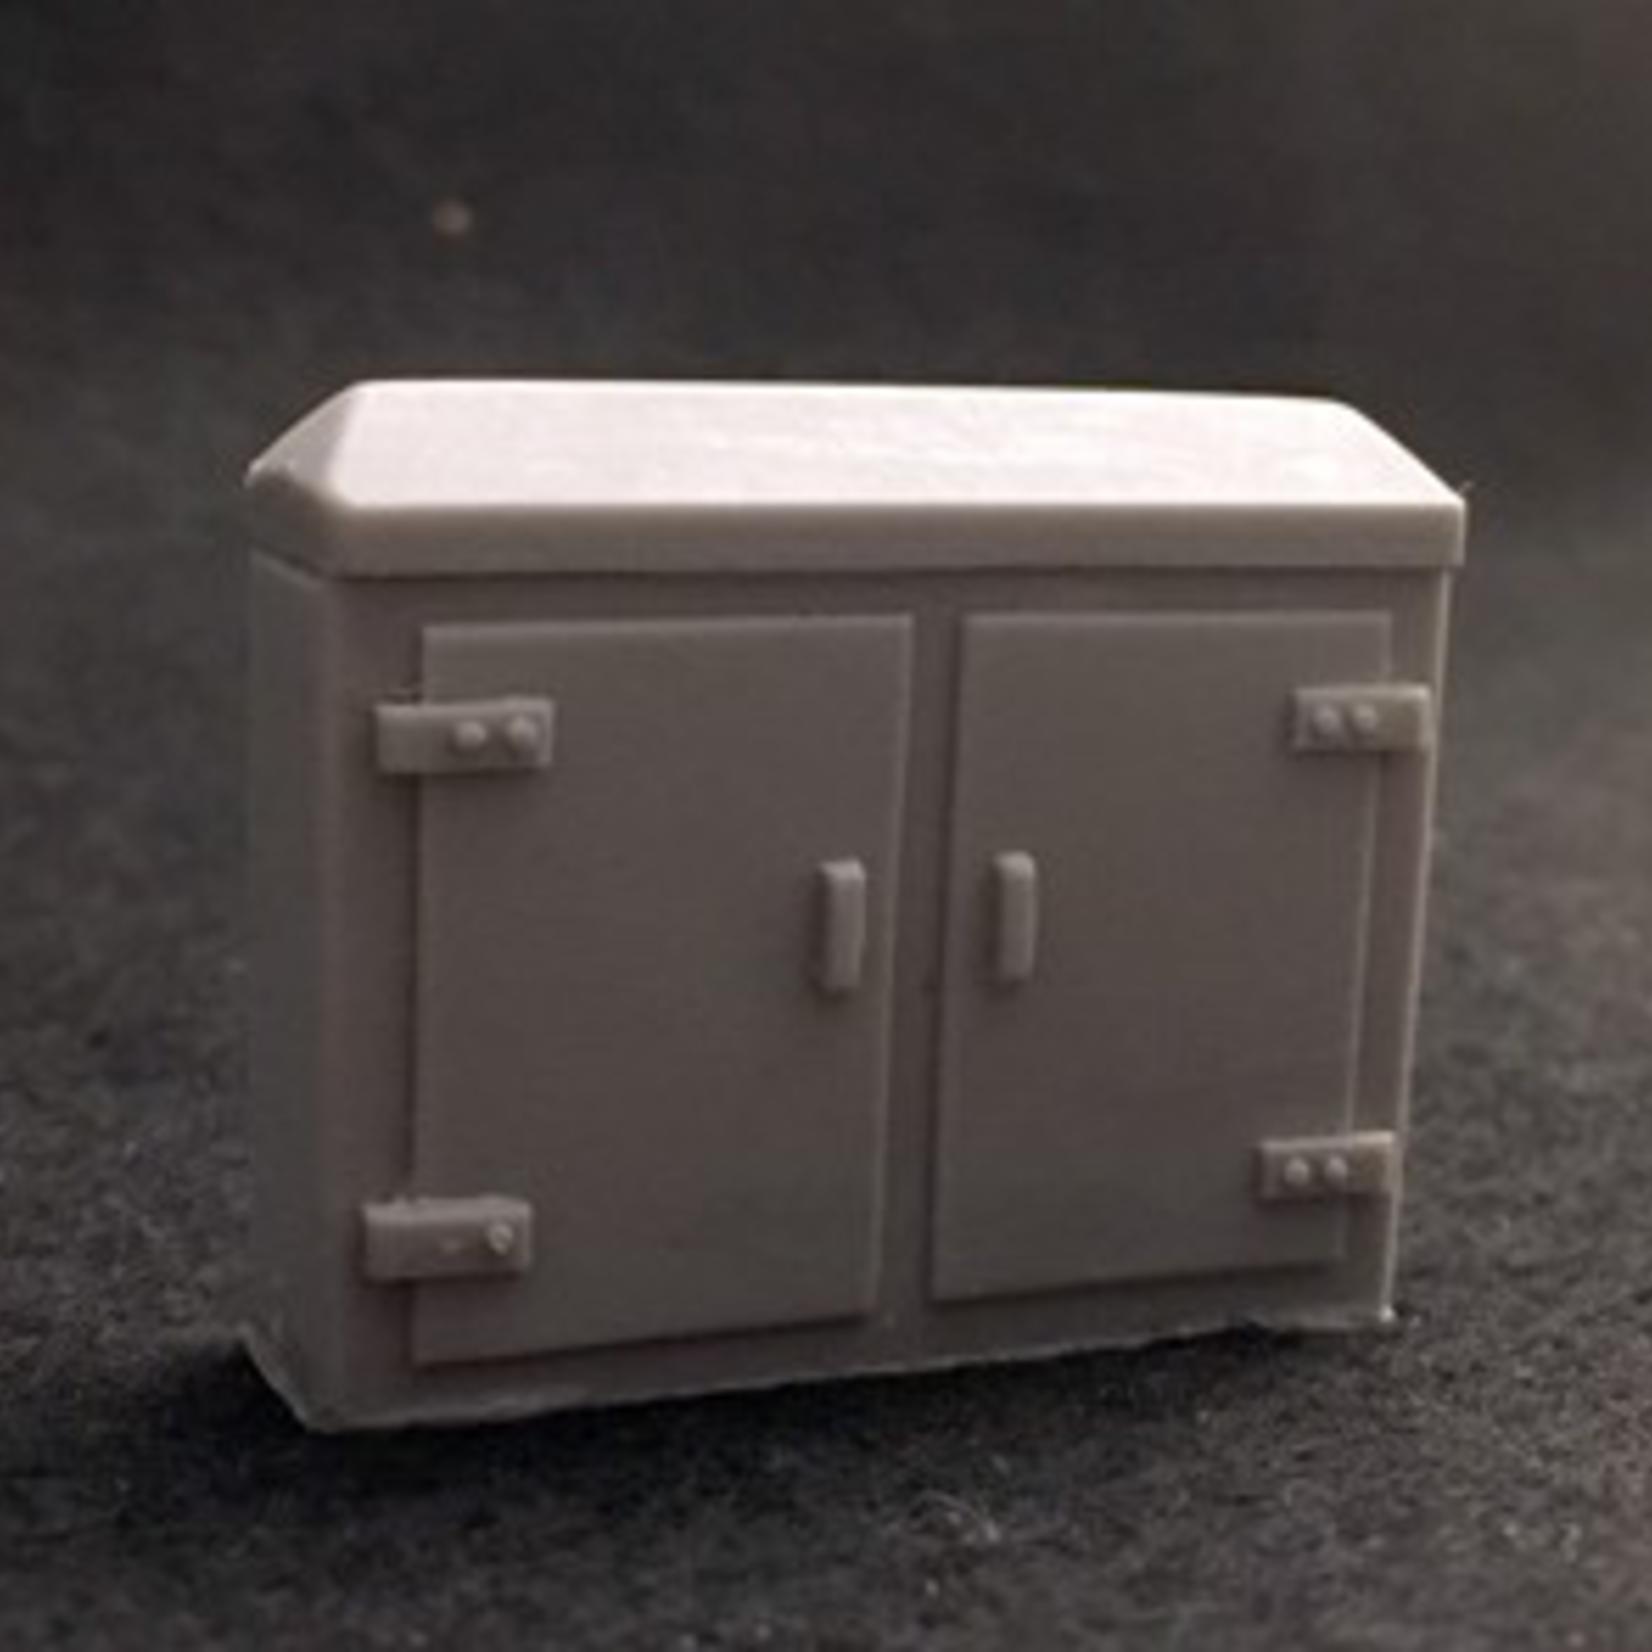 Telephone Junction Box